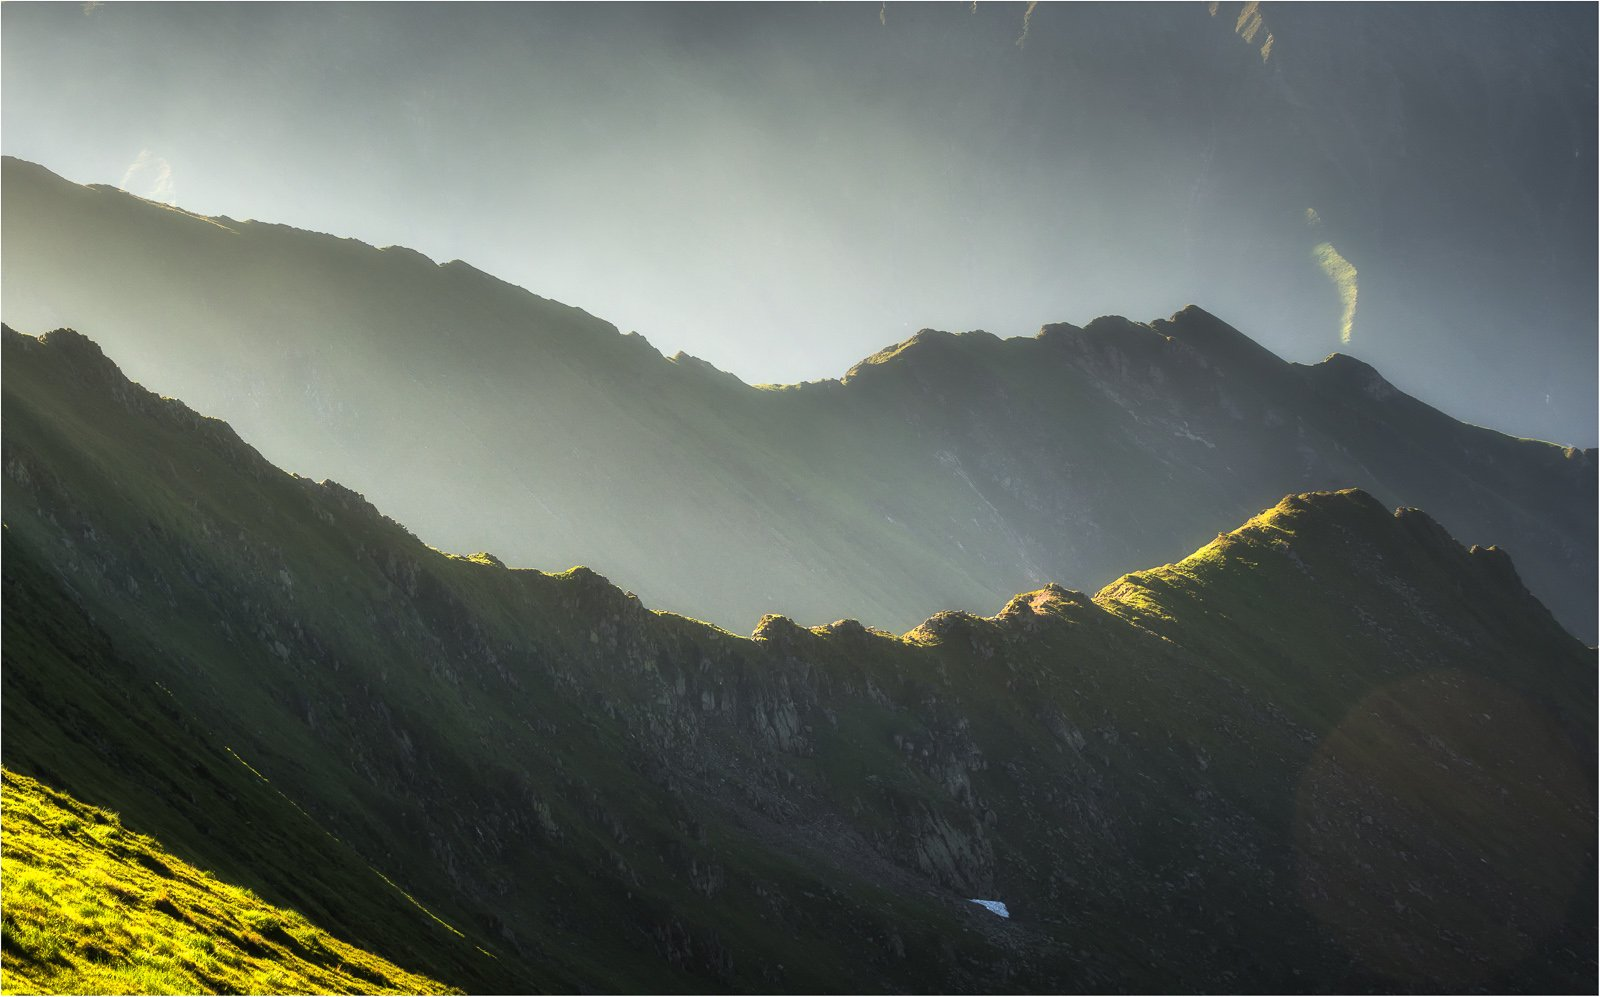 Landscape, Mountain, Peak, Romania, Ioan Chiriac